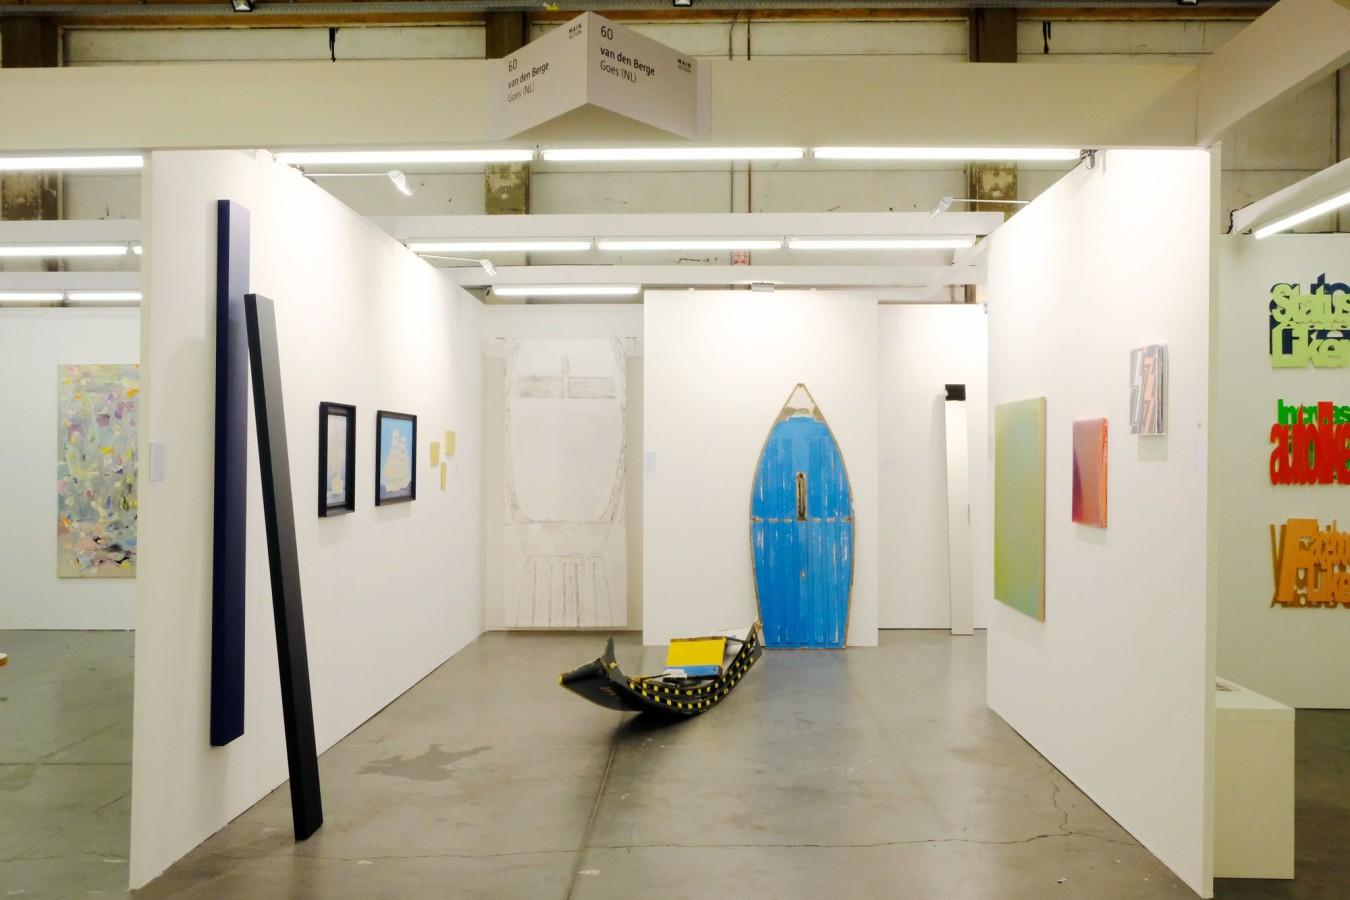 Art Rotterdam 2019, Harry Markusse, Jan van Munster, Jus Juchtmans, P.B. Van Rossem, Shawn Stipling, Tamara Dees,